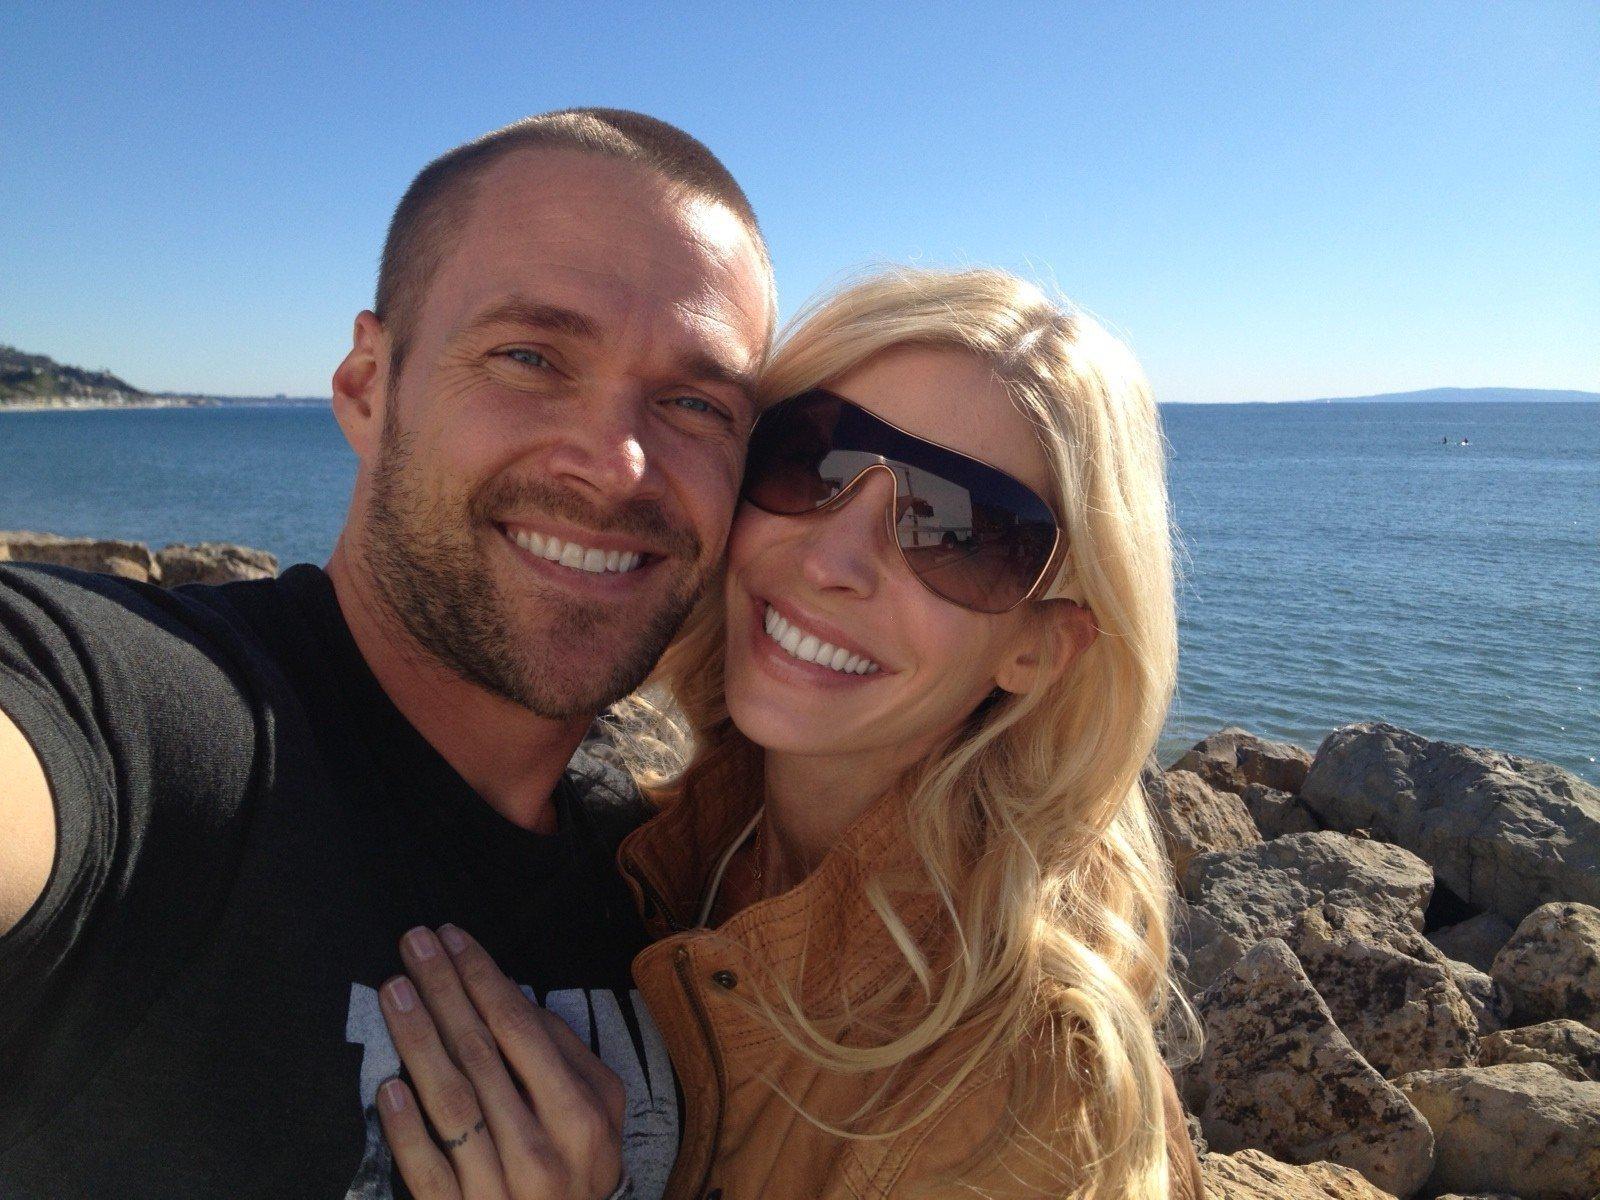 Heidi Powell and husband, Chris Powell at California beach https://heidipowell.net/198